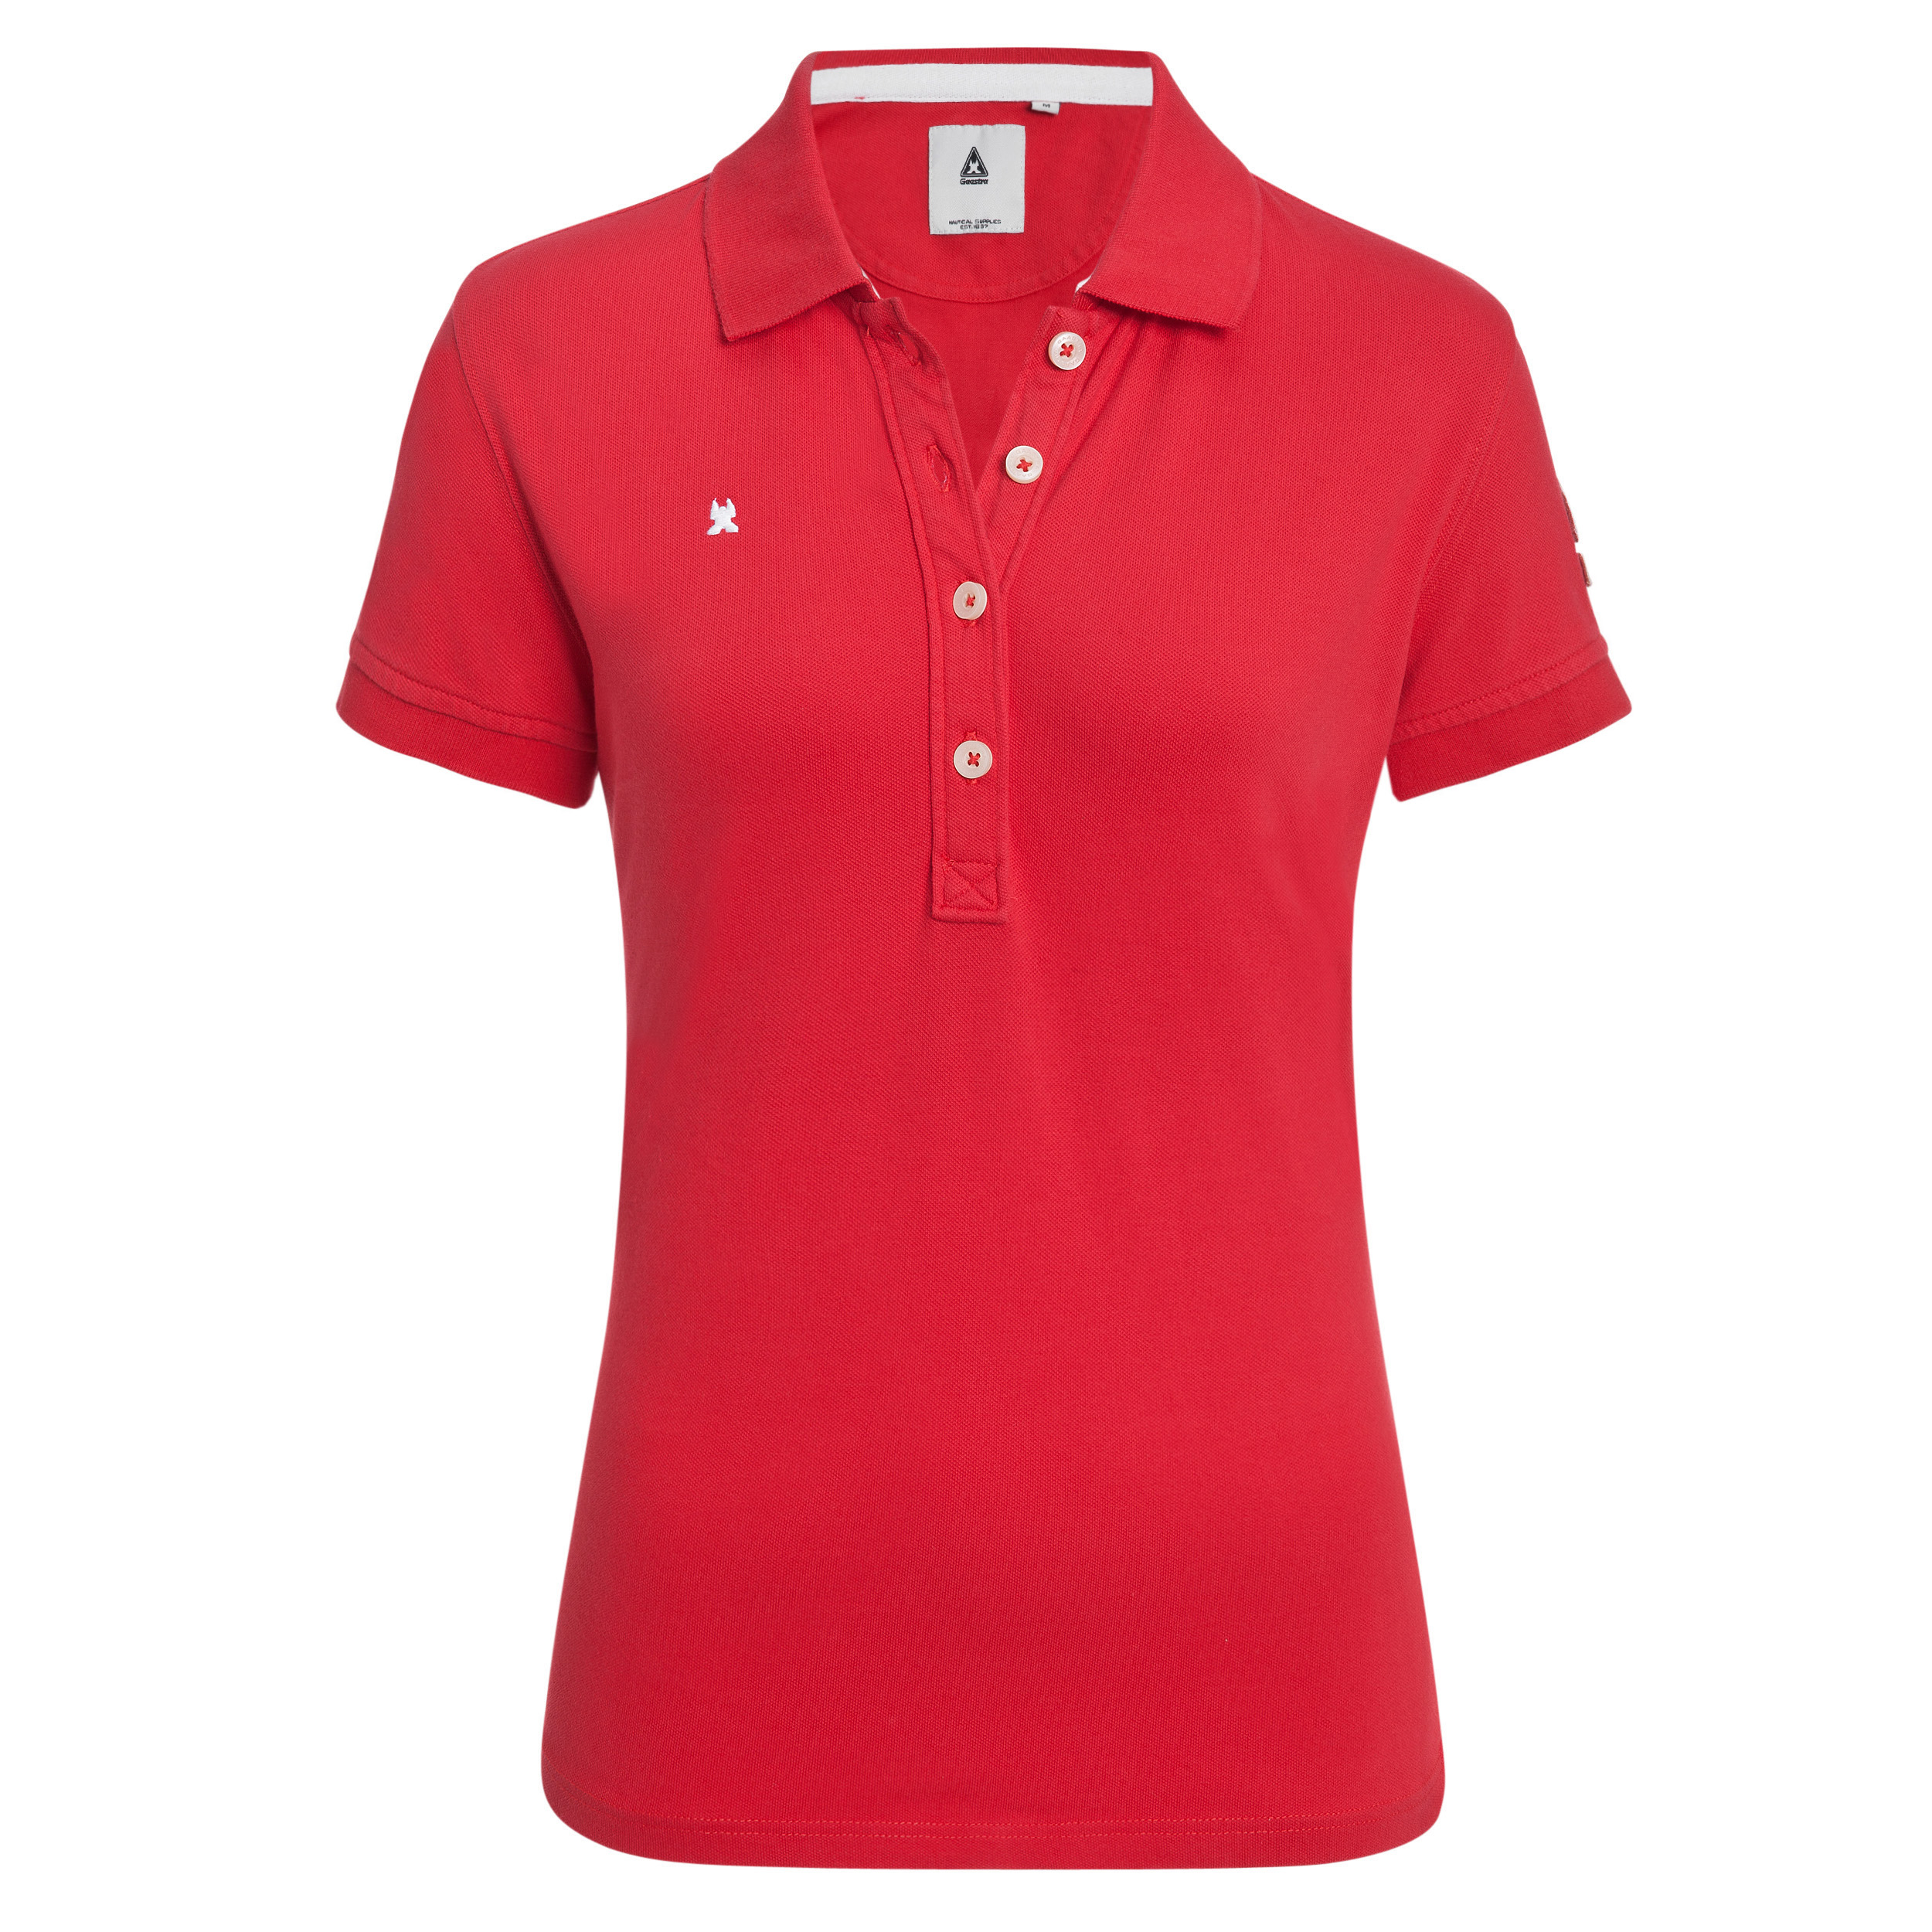 Polo shirt genua women clothes for sailing for H m polo shirt womens